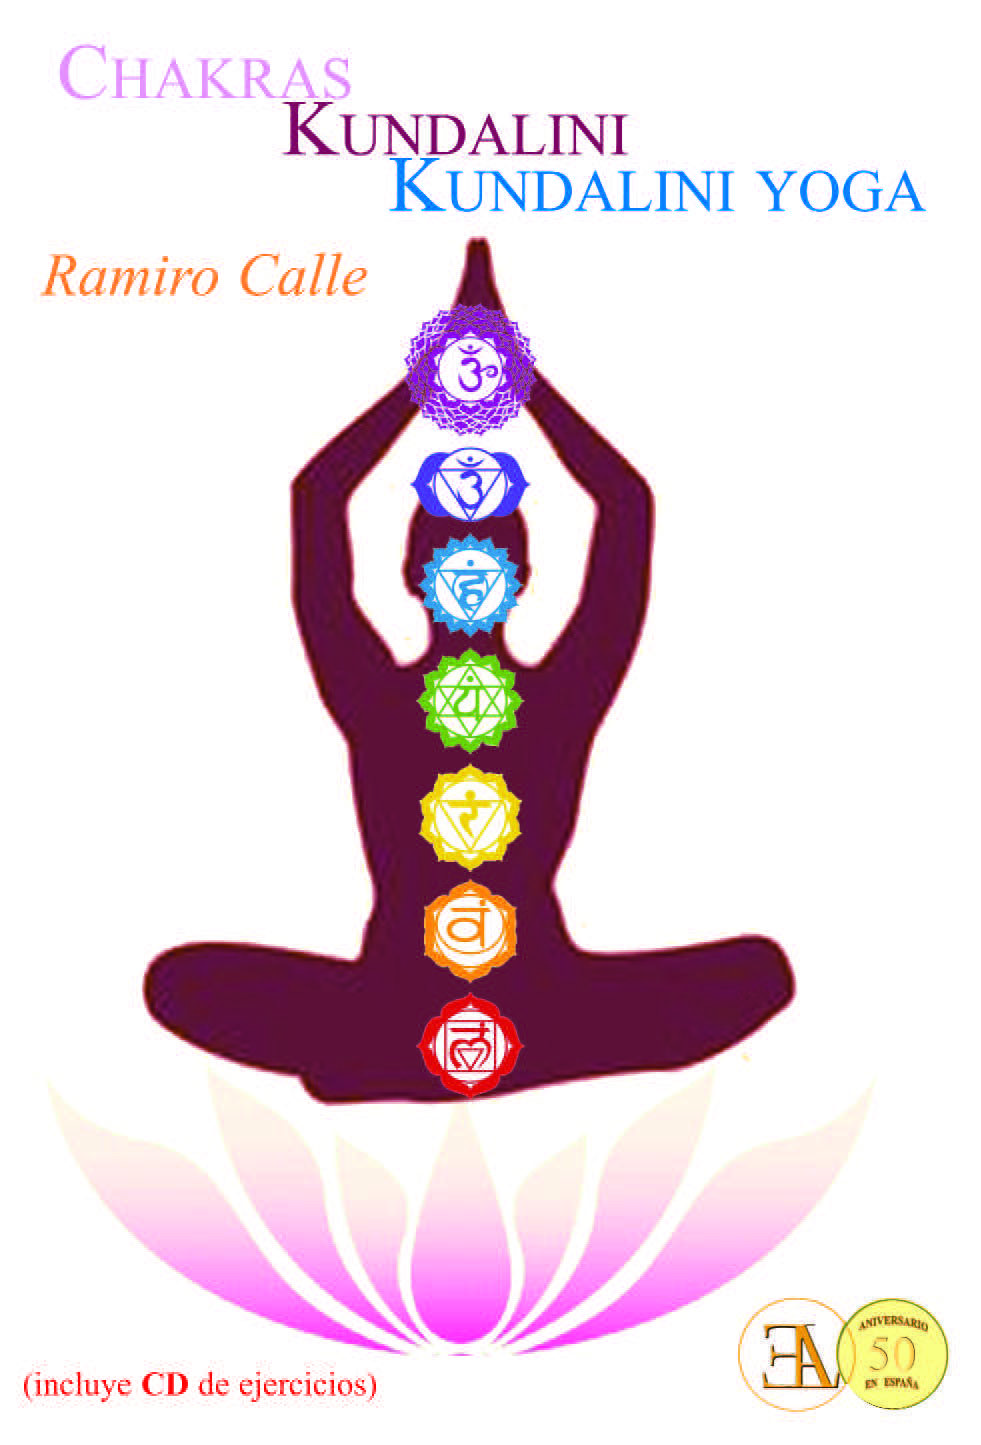 Chakras Kundalini Kundalini Yoga - Calle Ramiro